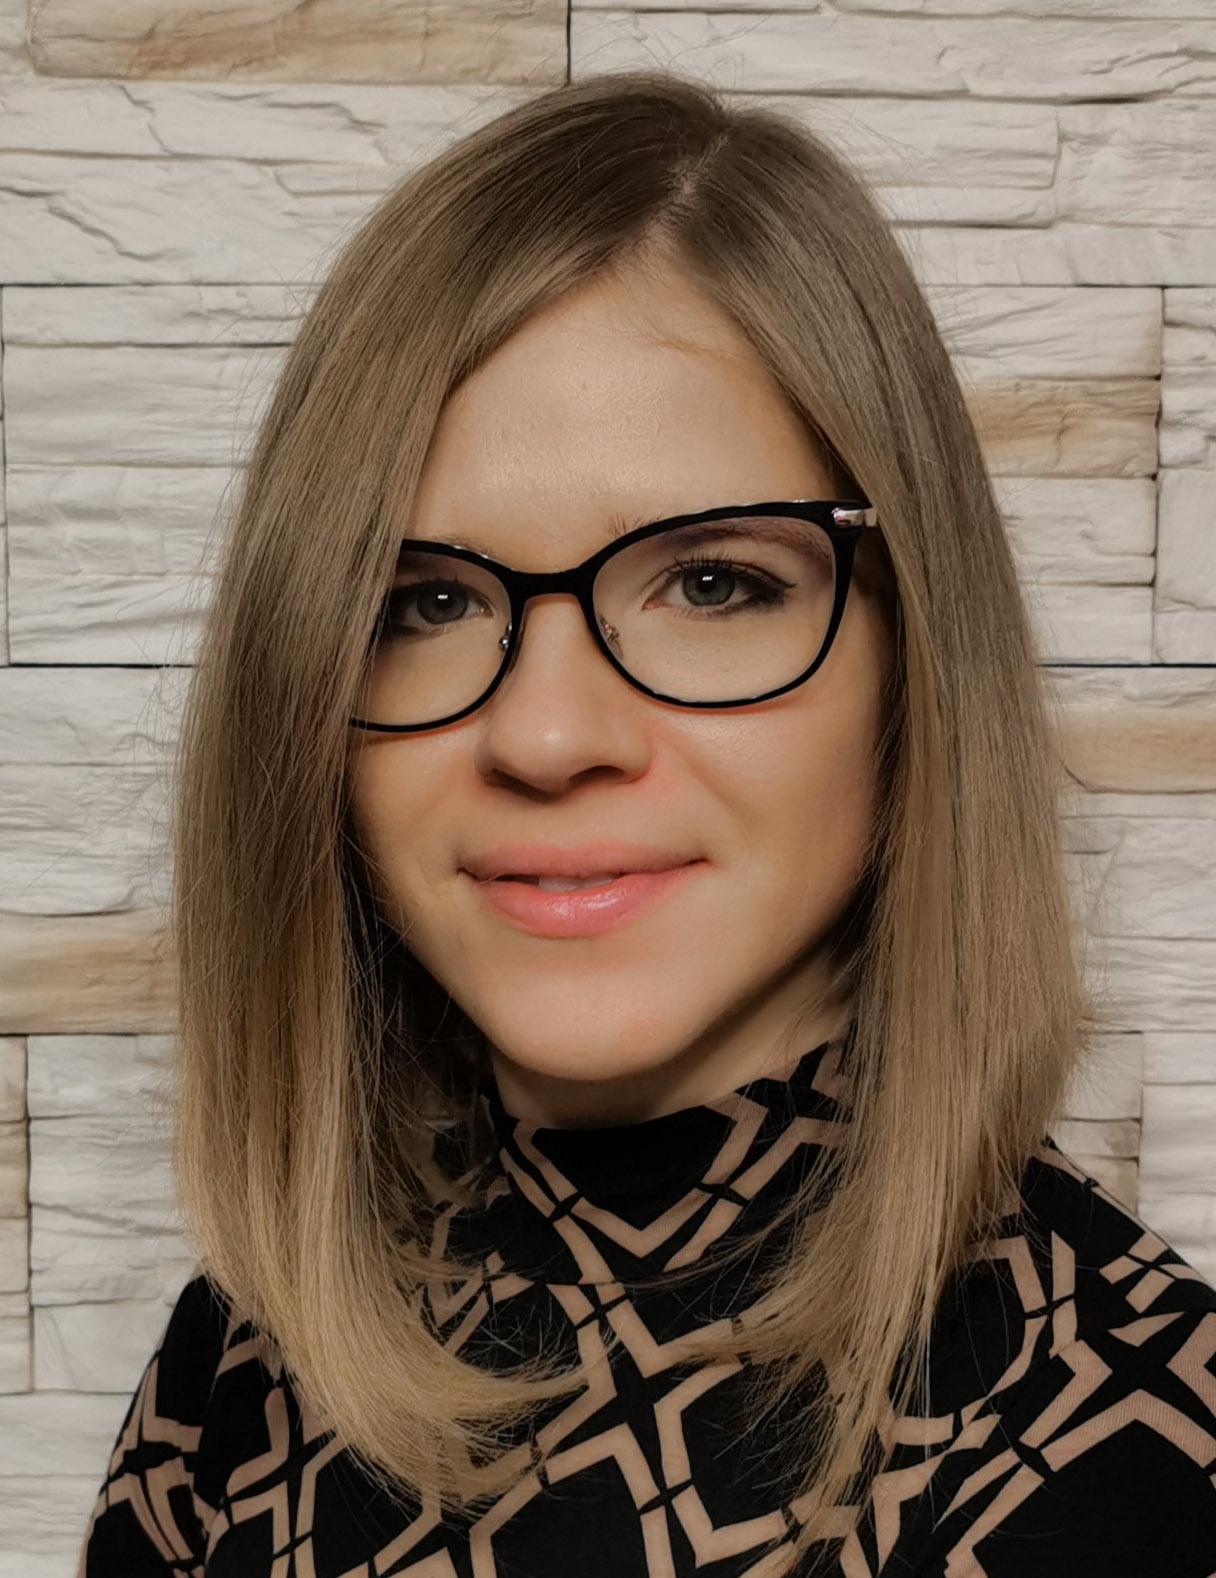 Monika Rolbiecka